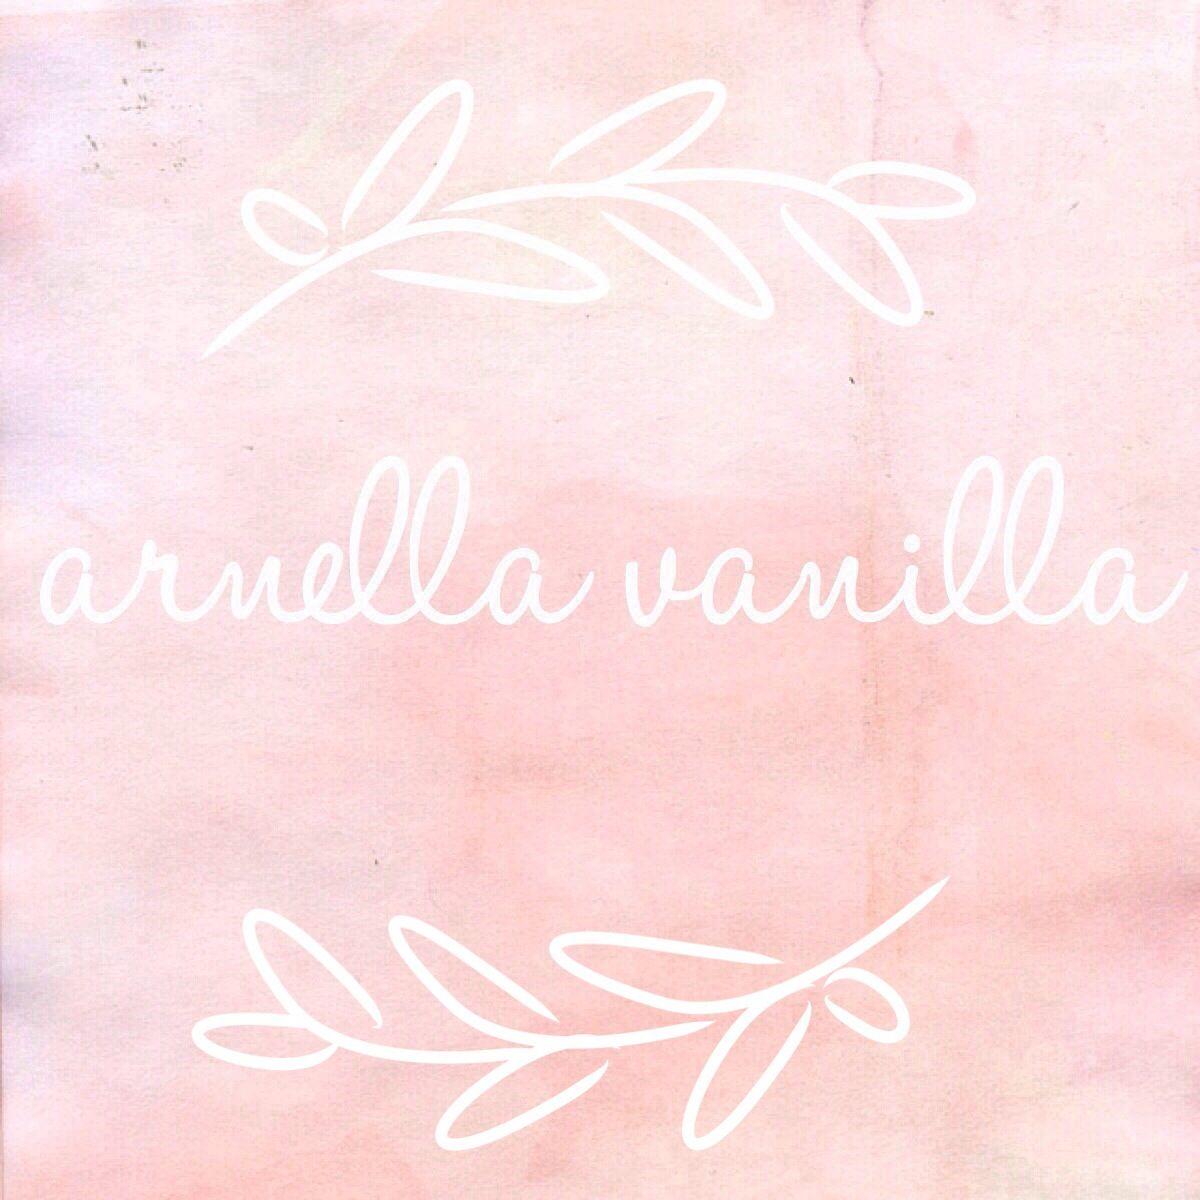 ArnellaVanilla